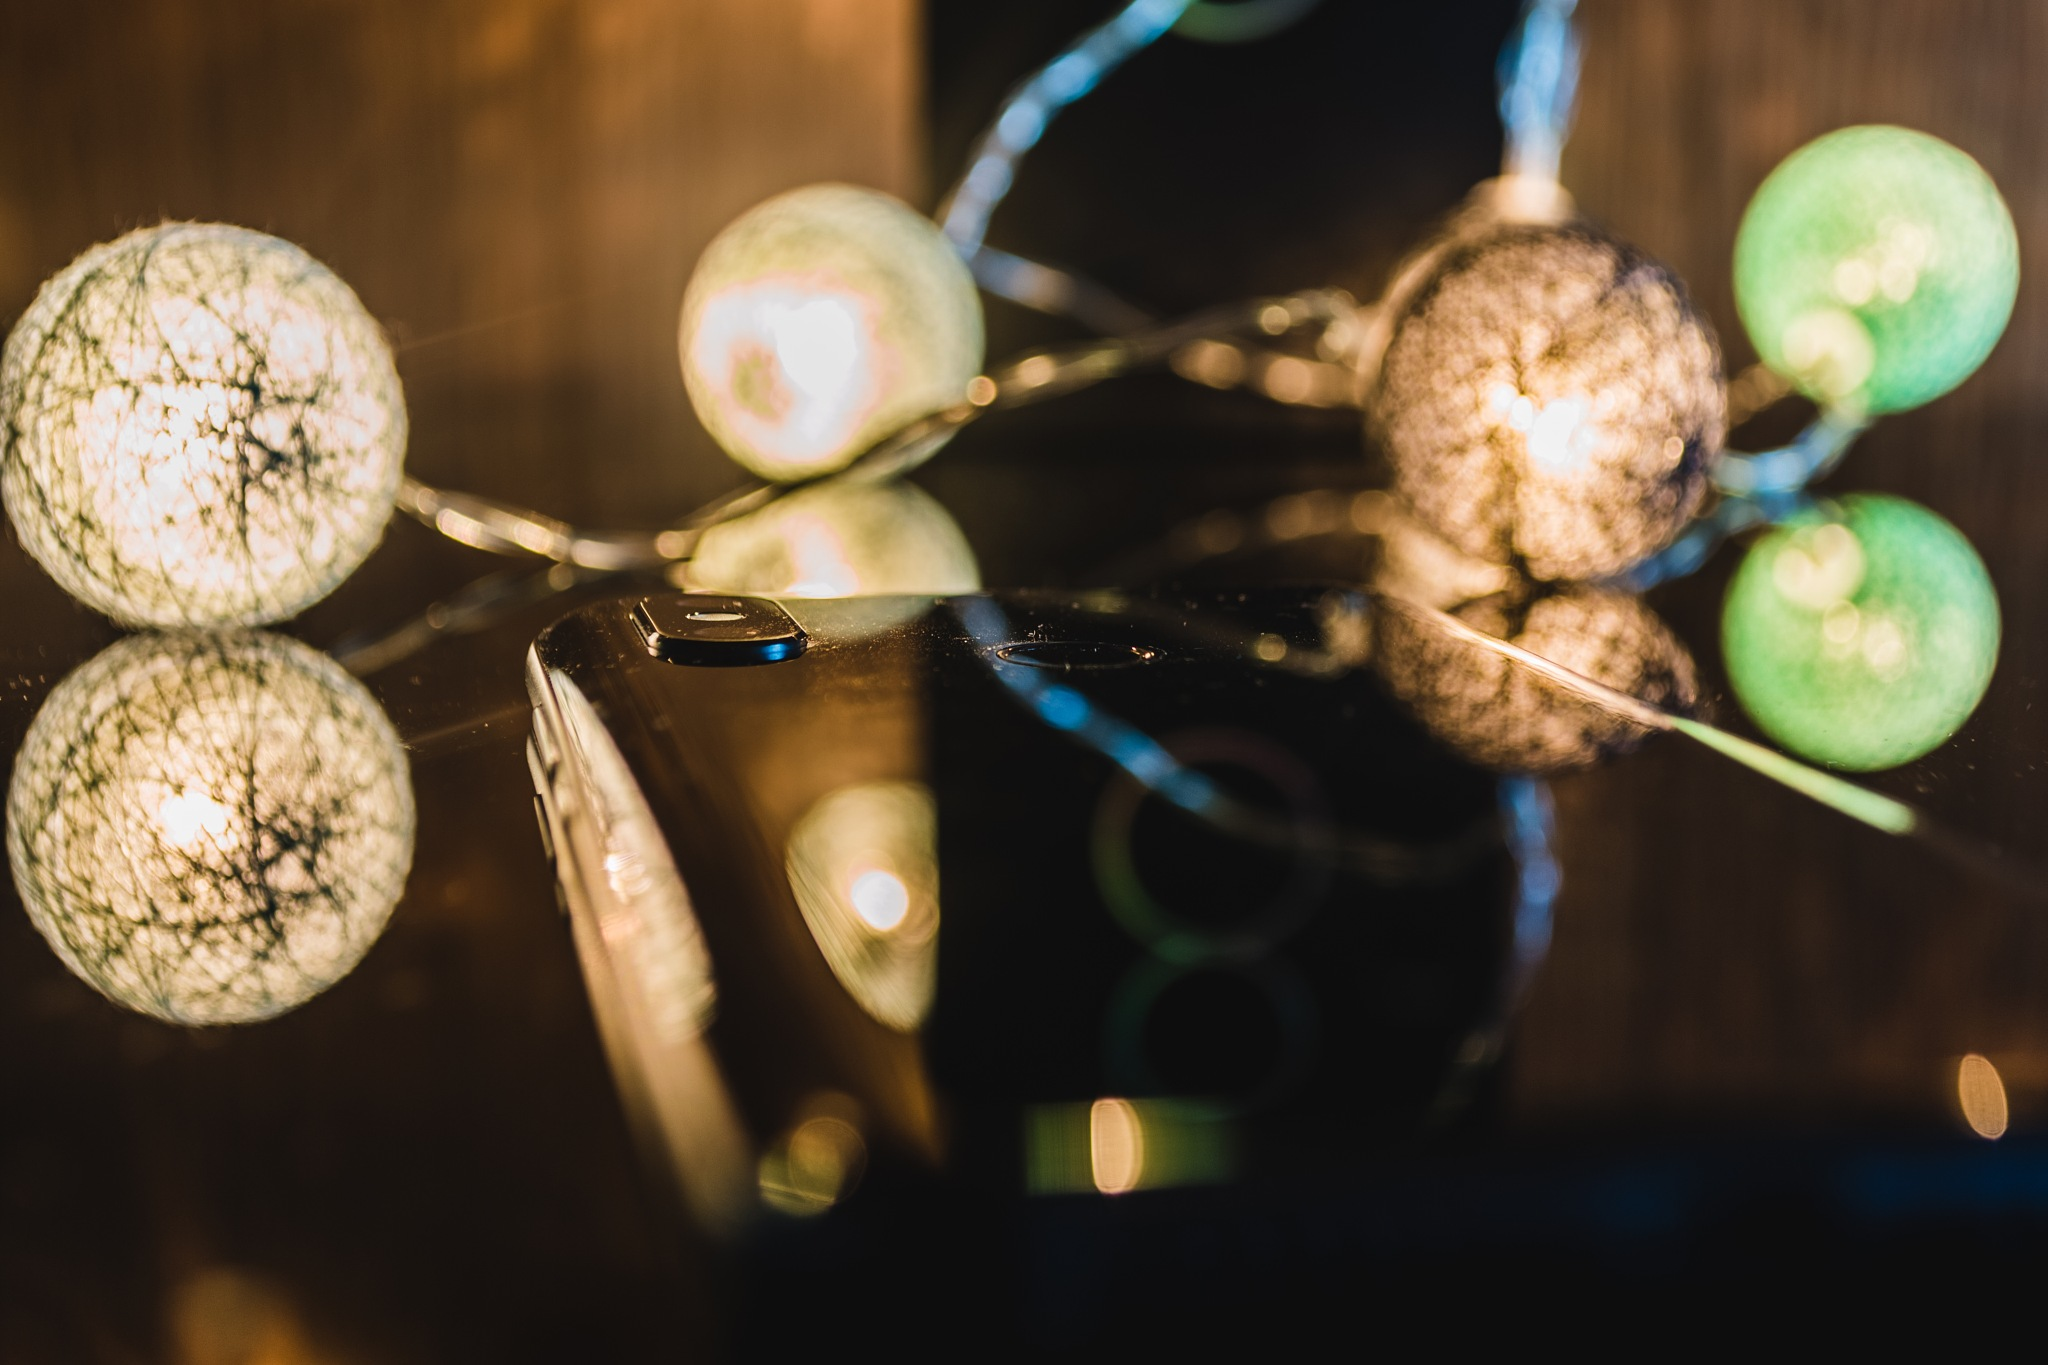 Xiaomi Mi 8 under christmas lights by catorzemiguel